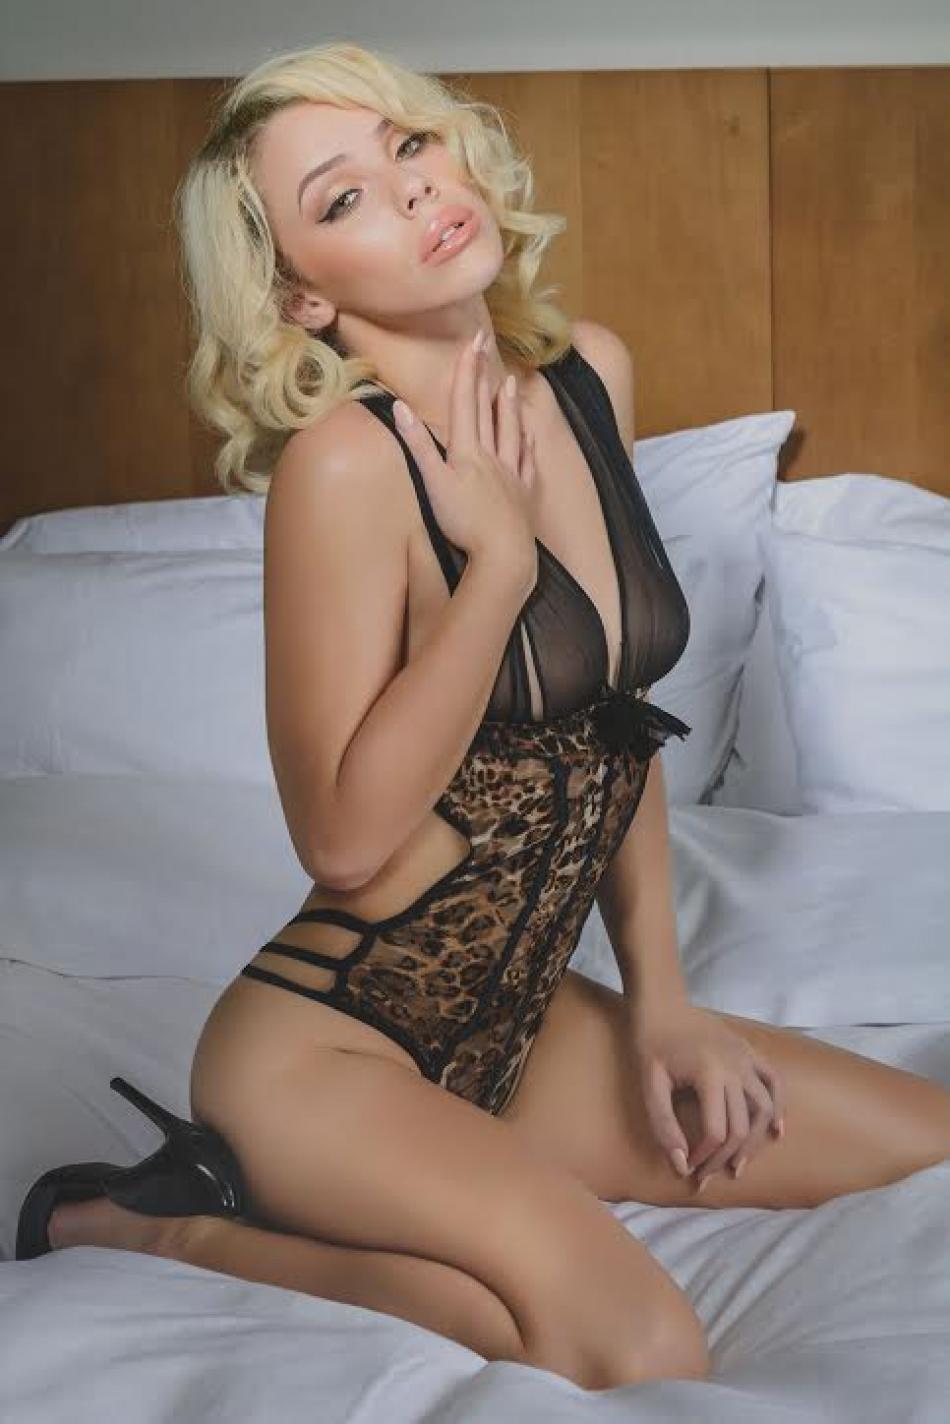 Ladyfordaddy.com Dora Escort Girl In New York 06050046 - 2 2